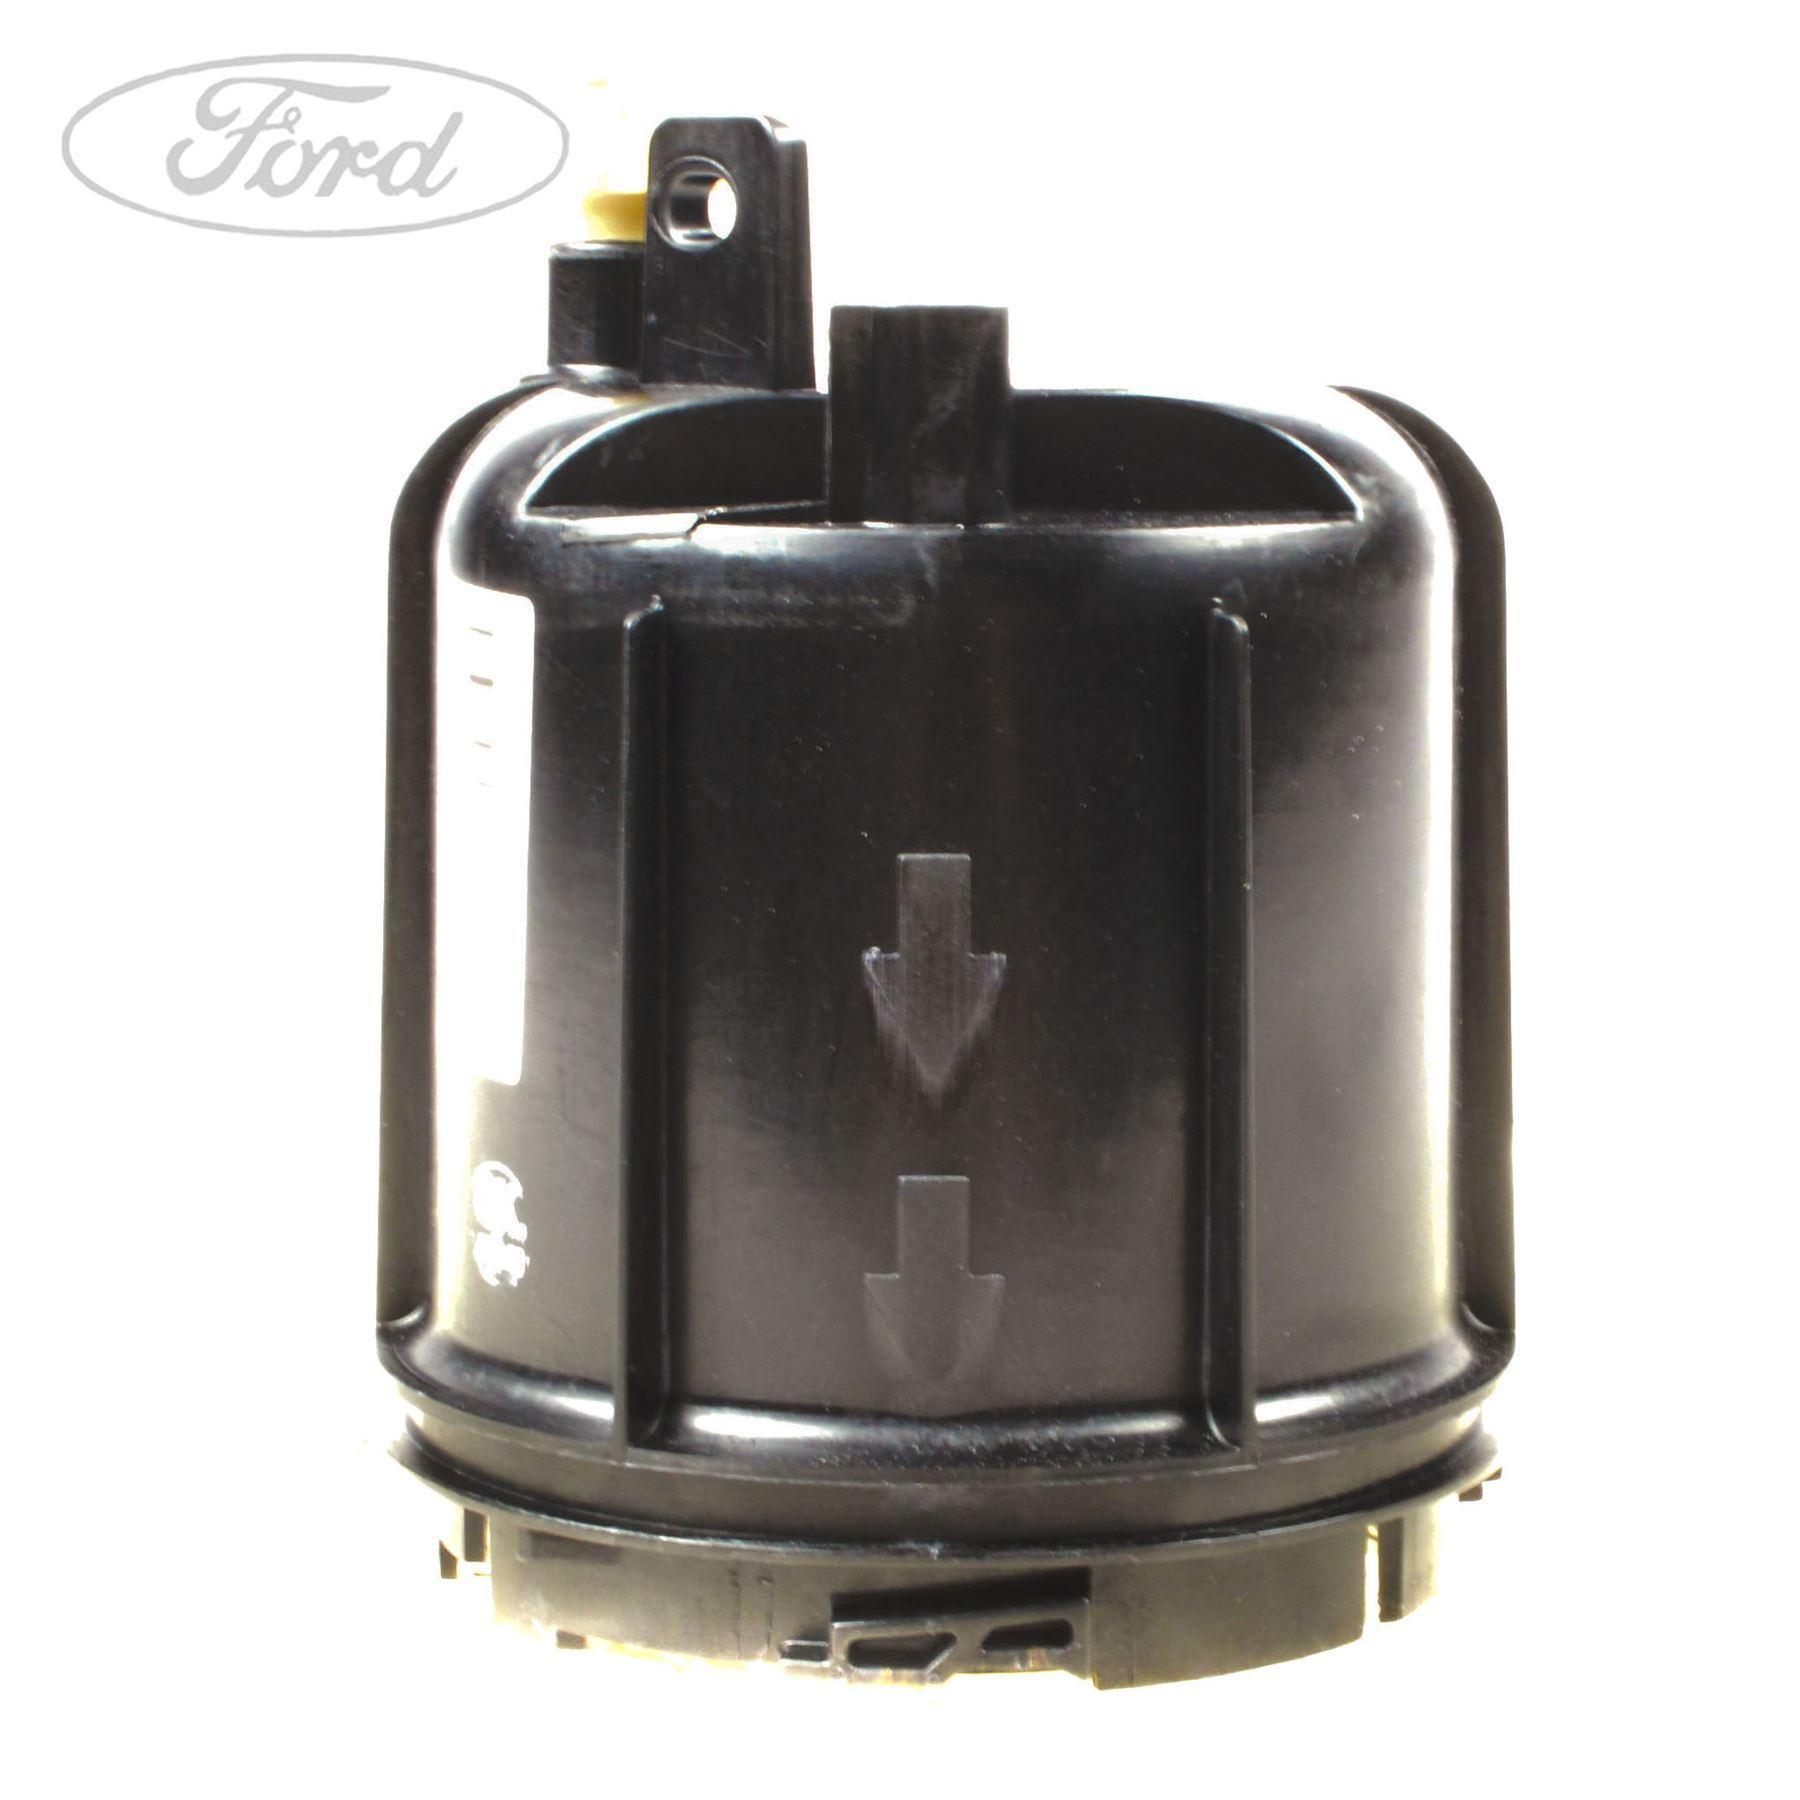 Genuine Ford Transit Mk8 Tourneo 22 Tdci Diesel Fuel Filter Housing Gmc 1781617